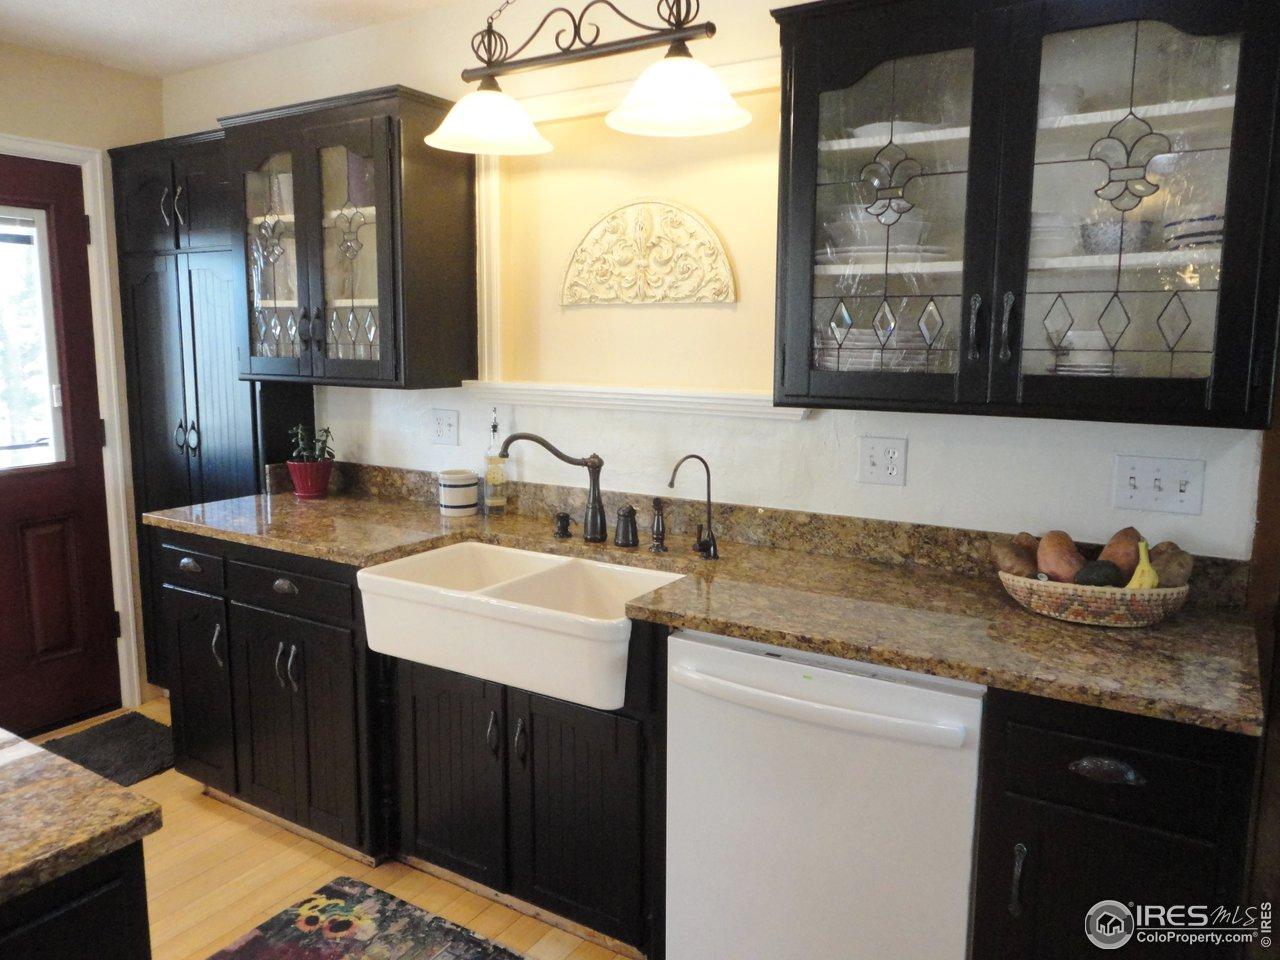 Granite Counters & Farmhouse Style Apron Sink